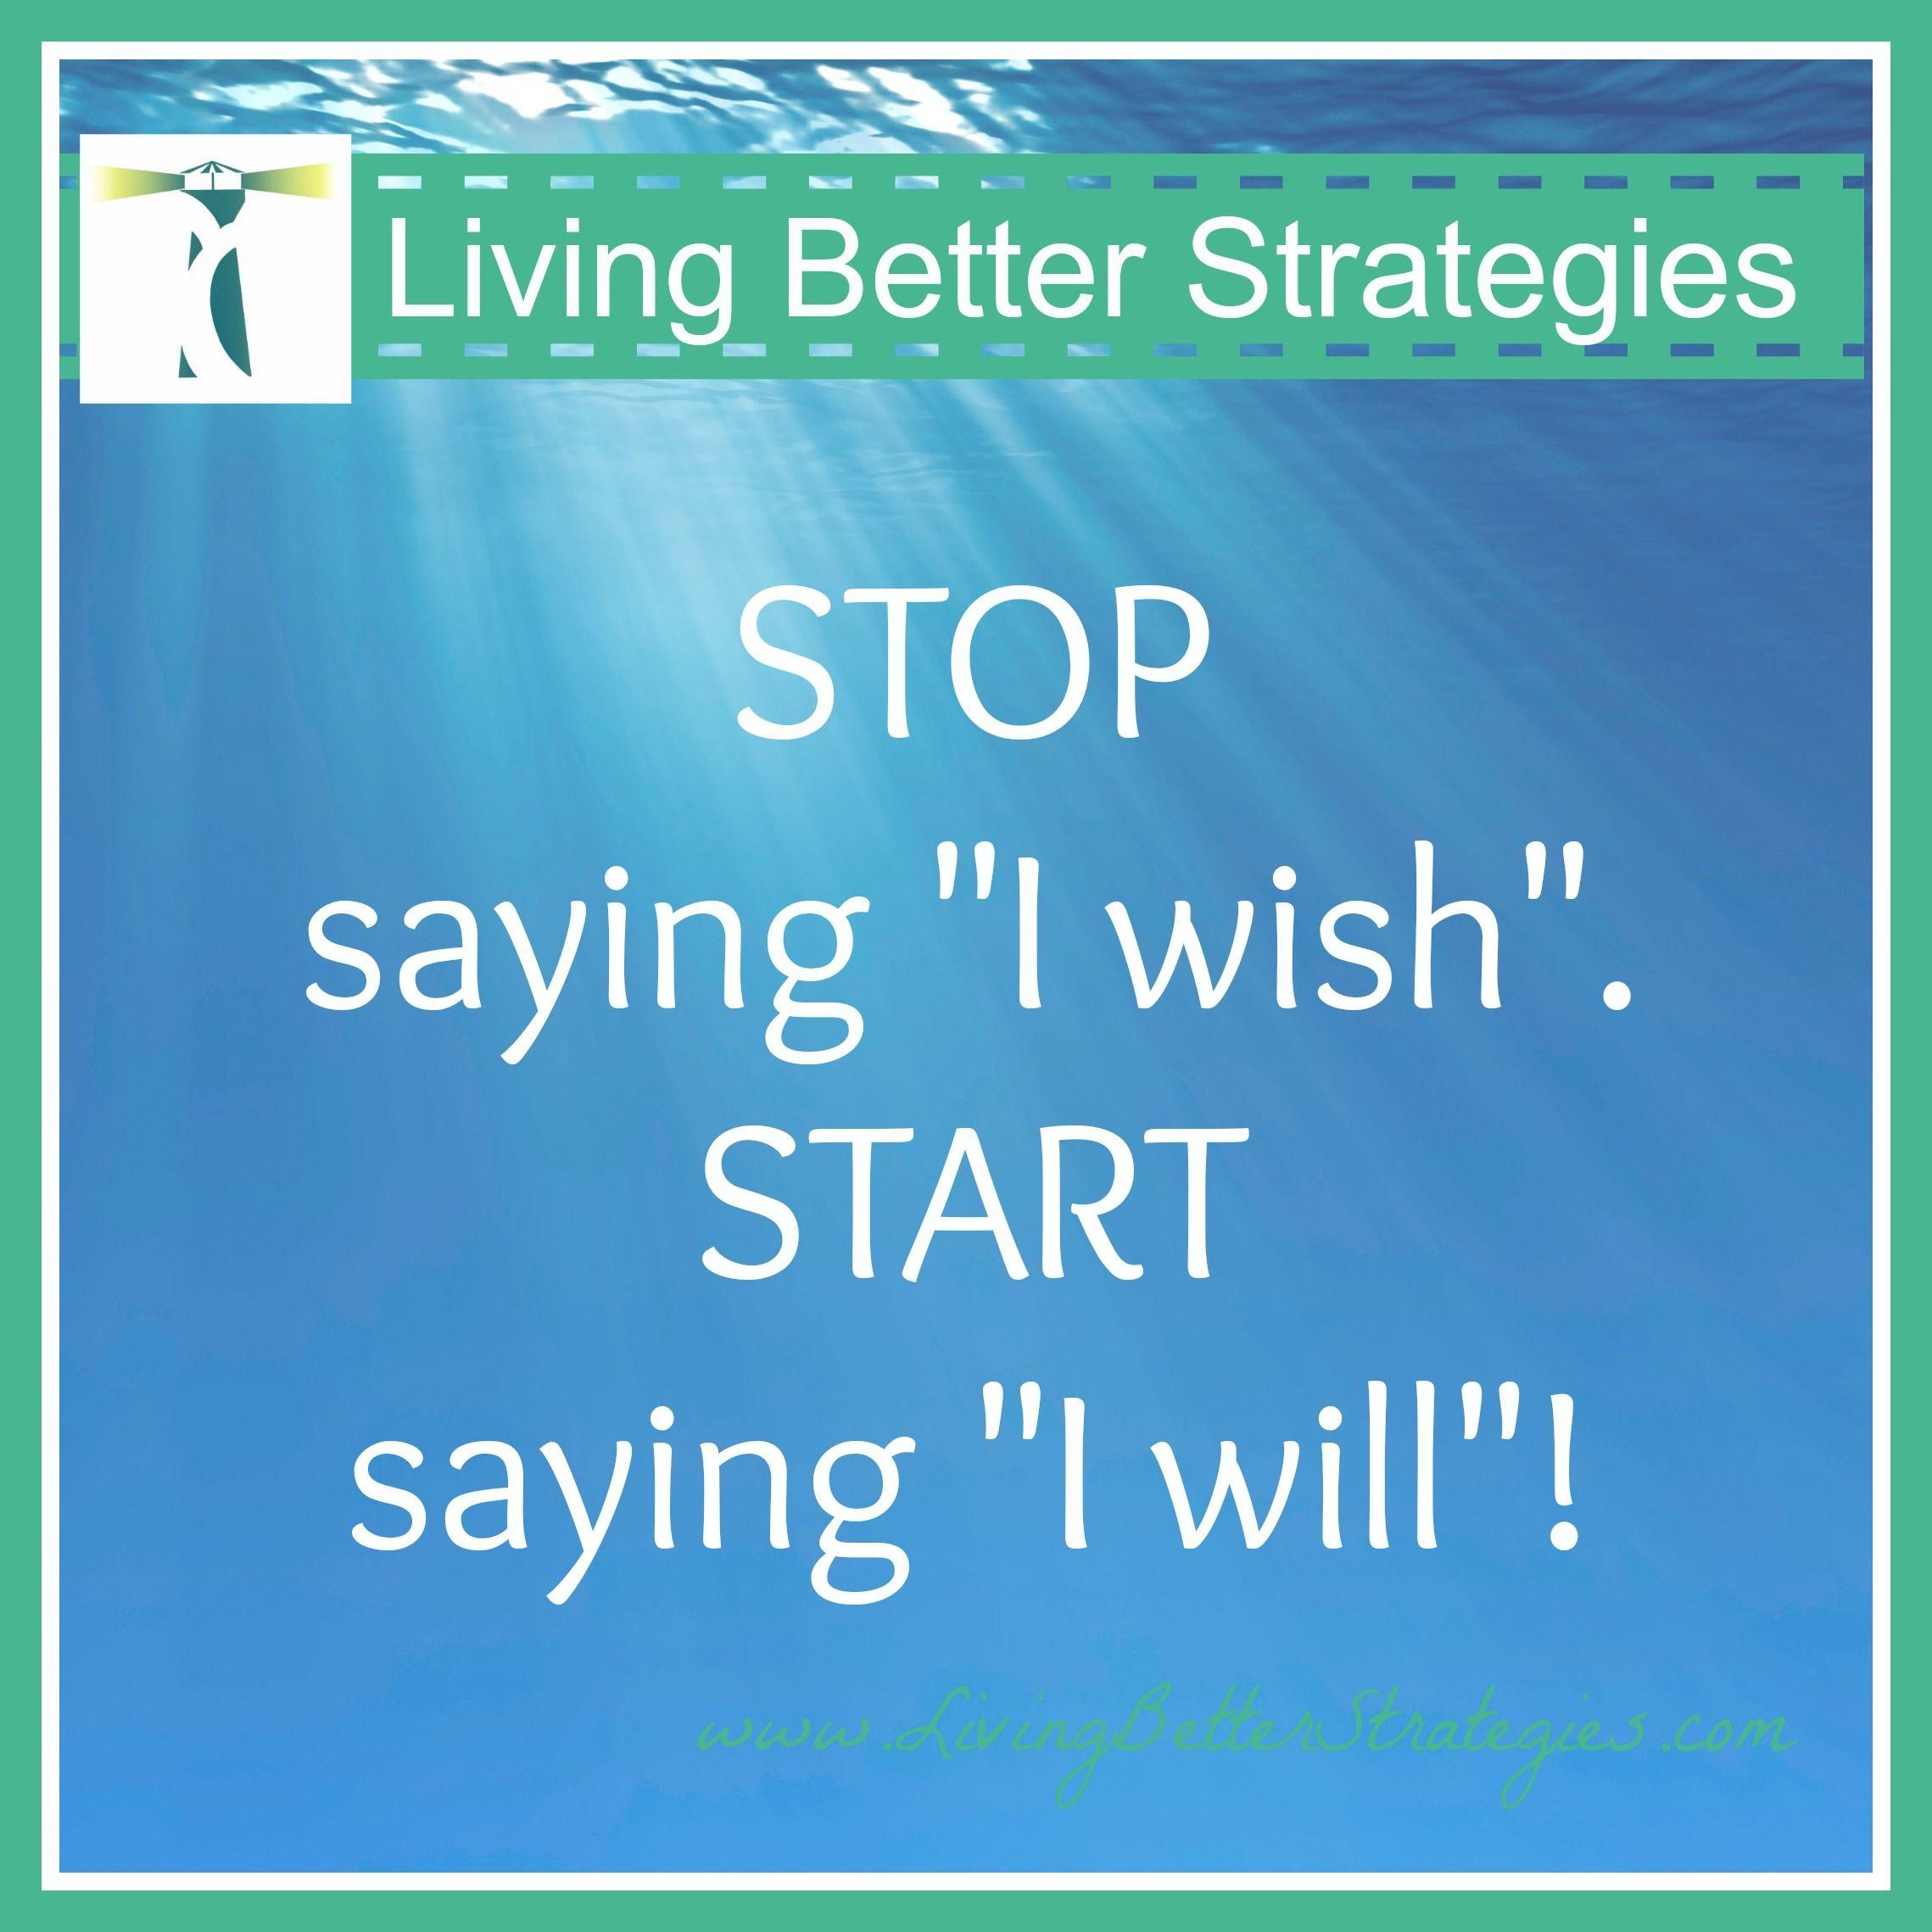 Stop saying I wish, start saying I will.